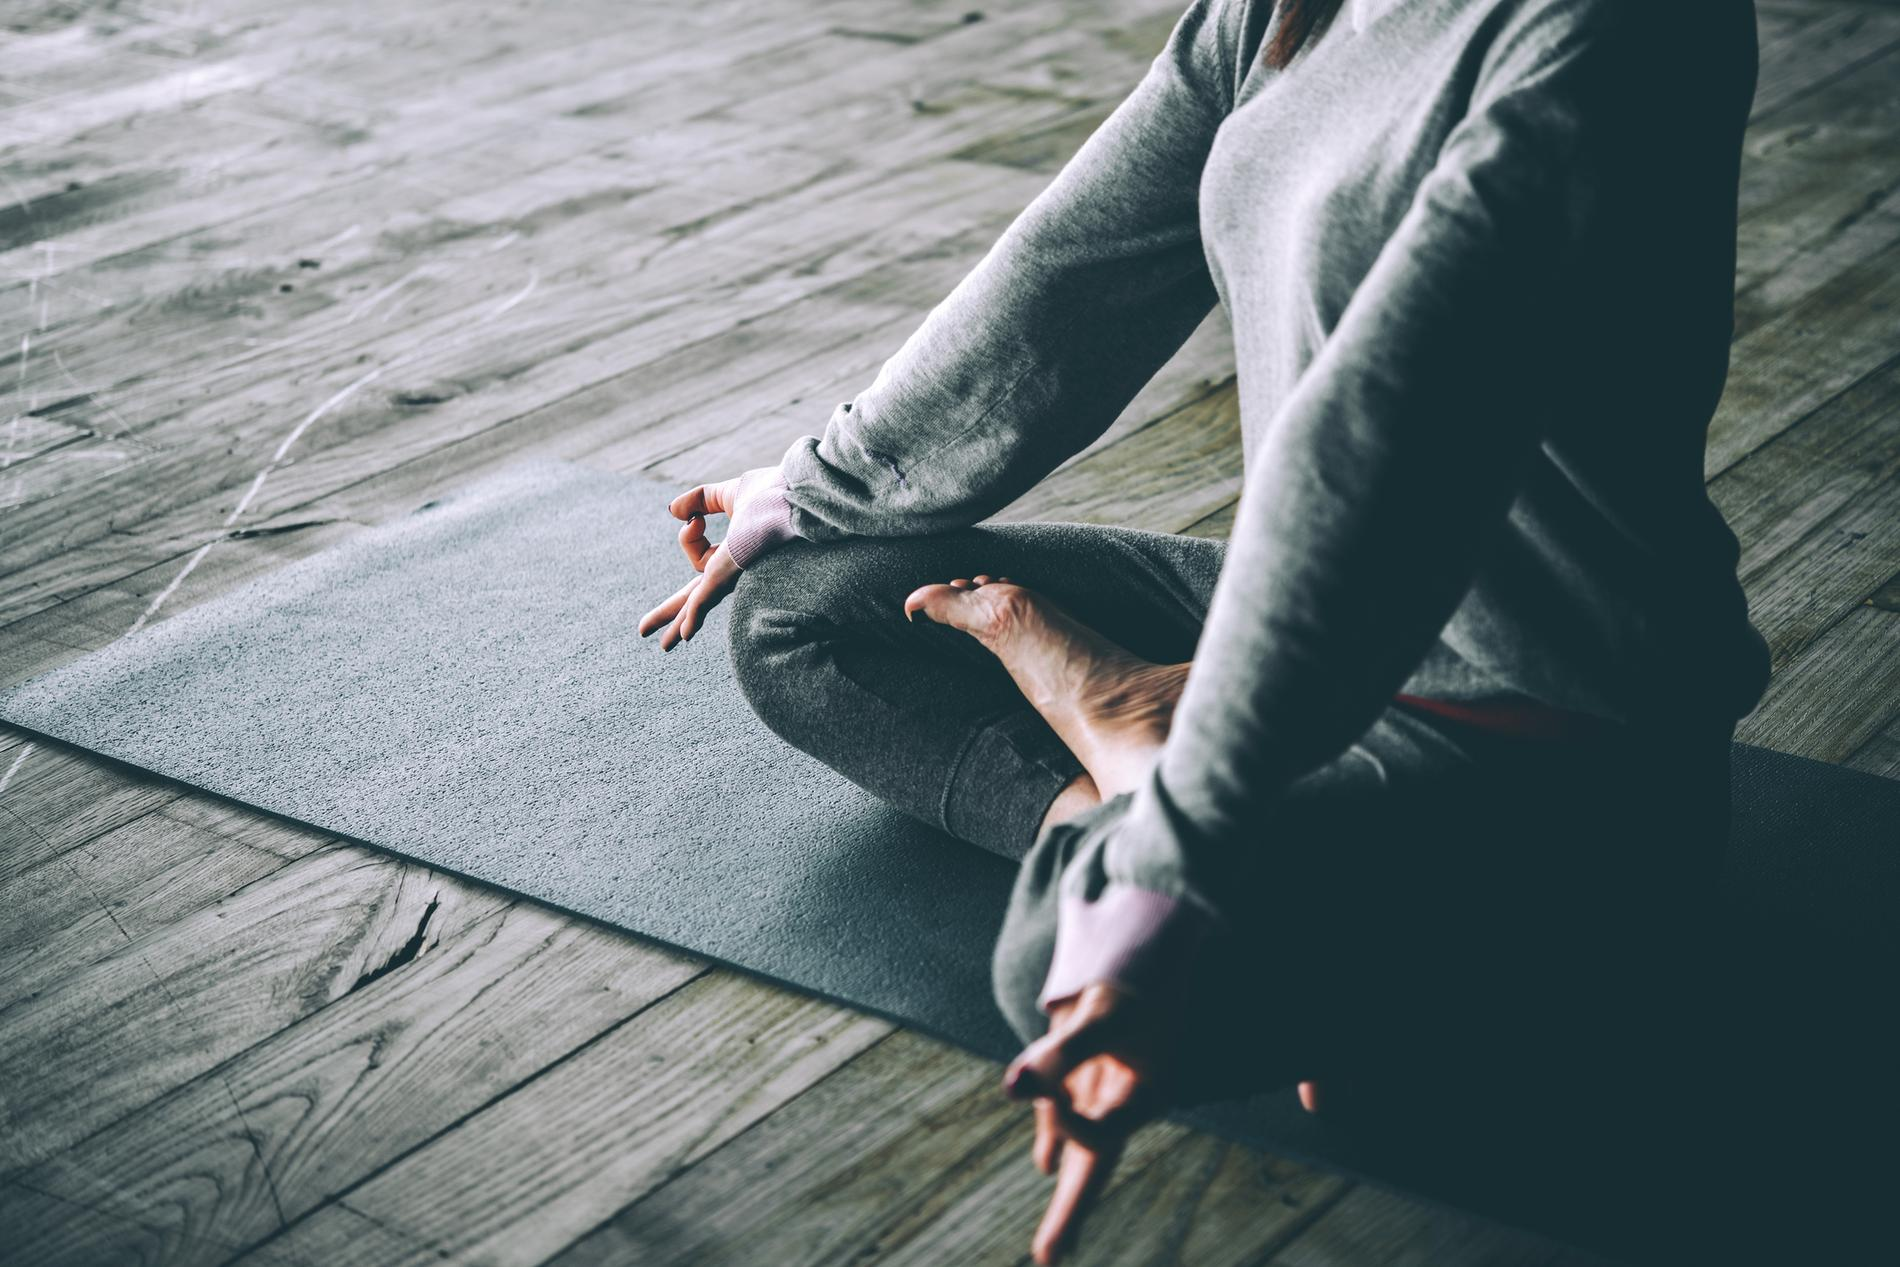 Que porter pour faire du yoga   - Madame Figaro b4b48821a25